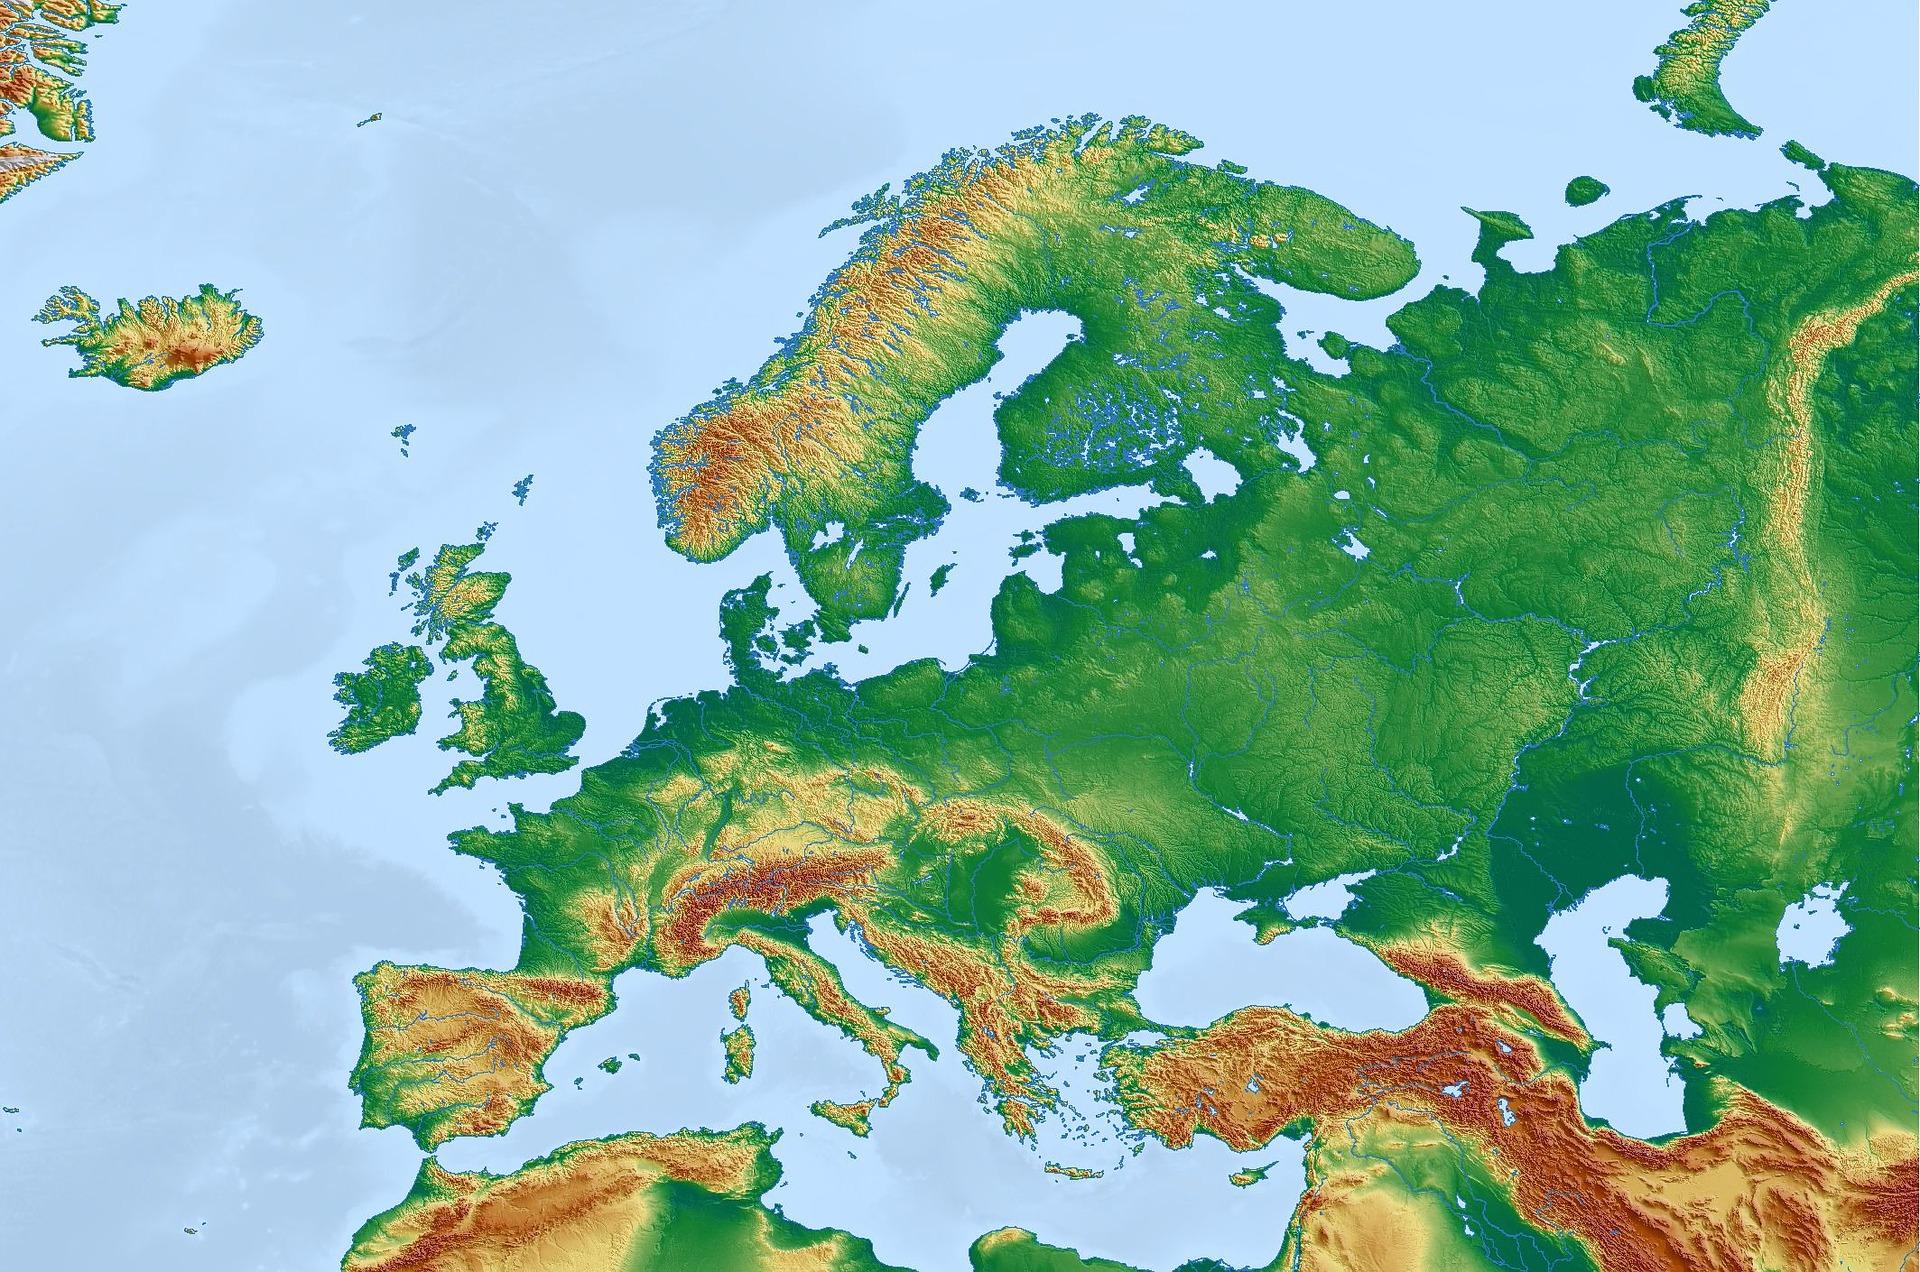 Eurobiotech Report Biontech Pfizer Advance Covid 19 Plan Novartis Data And Oncoone Round Fiercebiotech